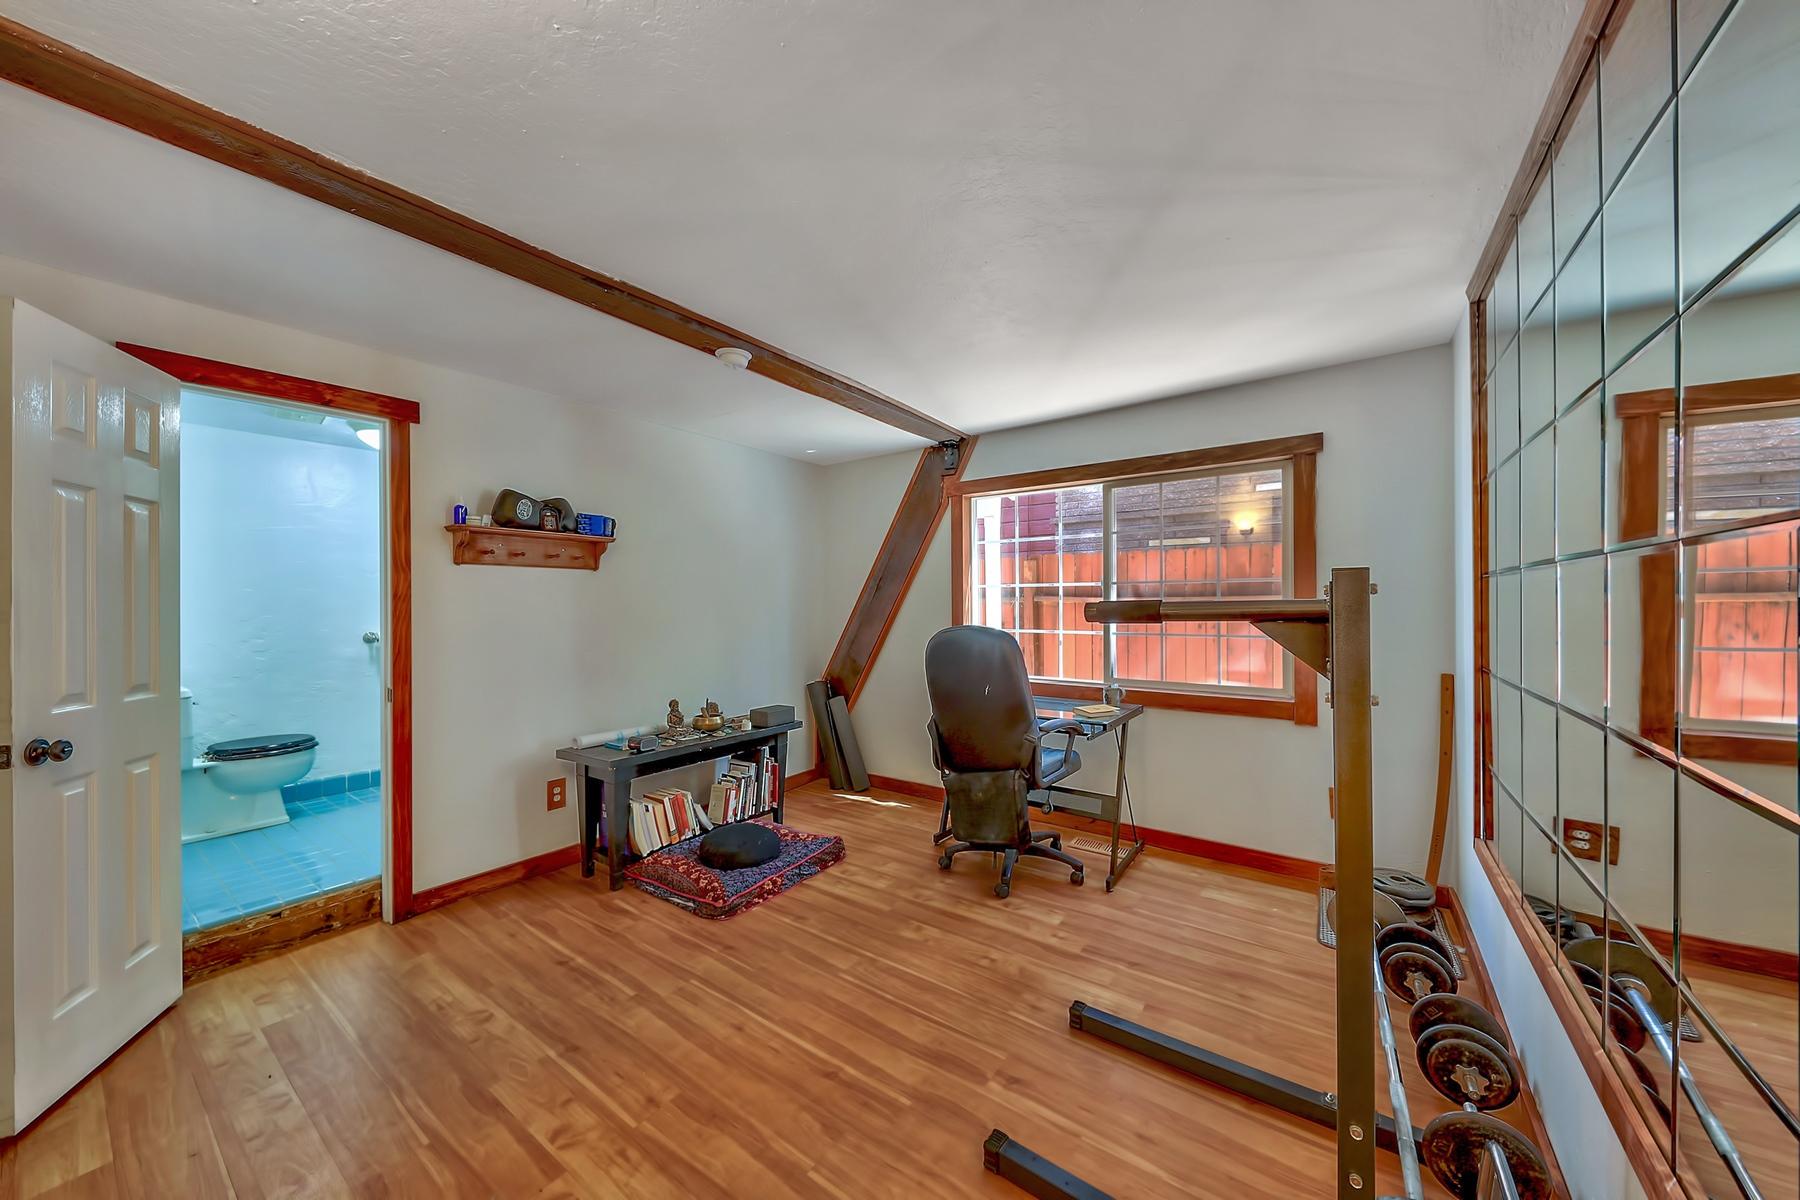 Additional photo for property listing at 731 Tahoe Keys Blvd, South Lake Tahoe, CA 96150 731 Tahoe Keys Blvd South Lake Tahoe, California 96150 Estados Unidos